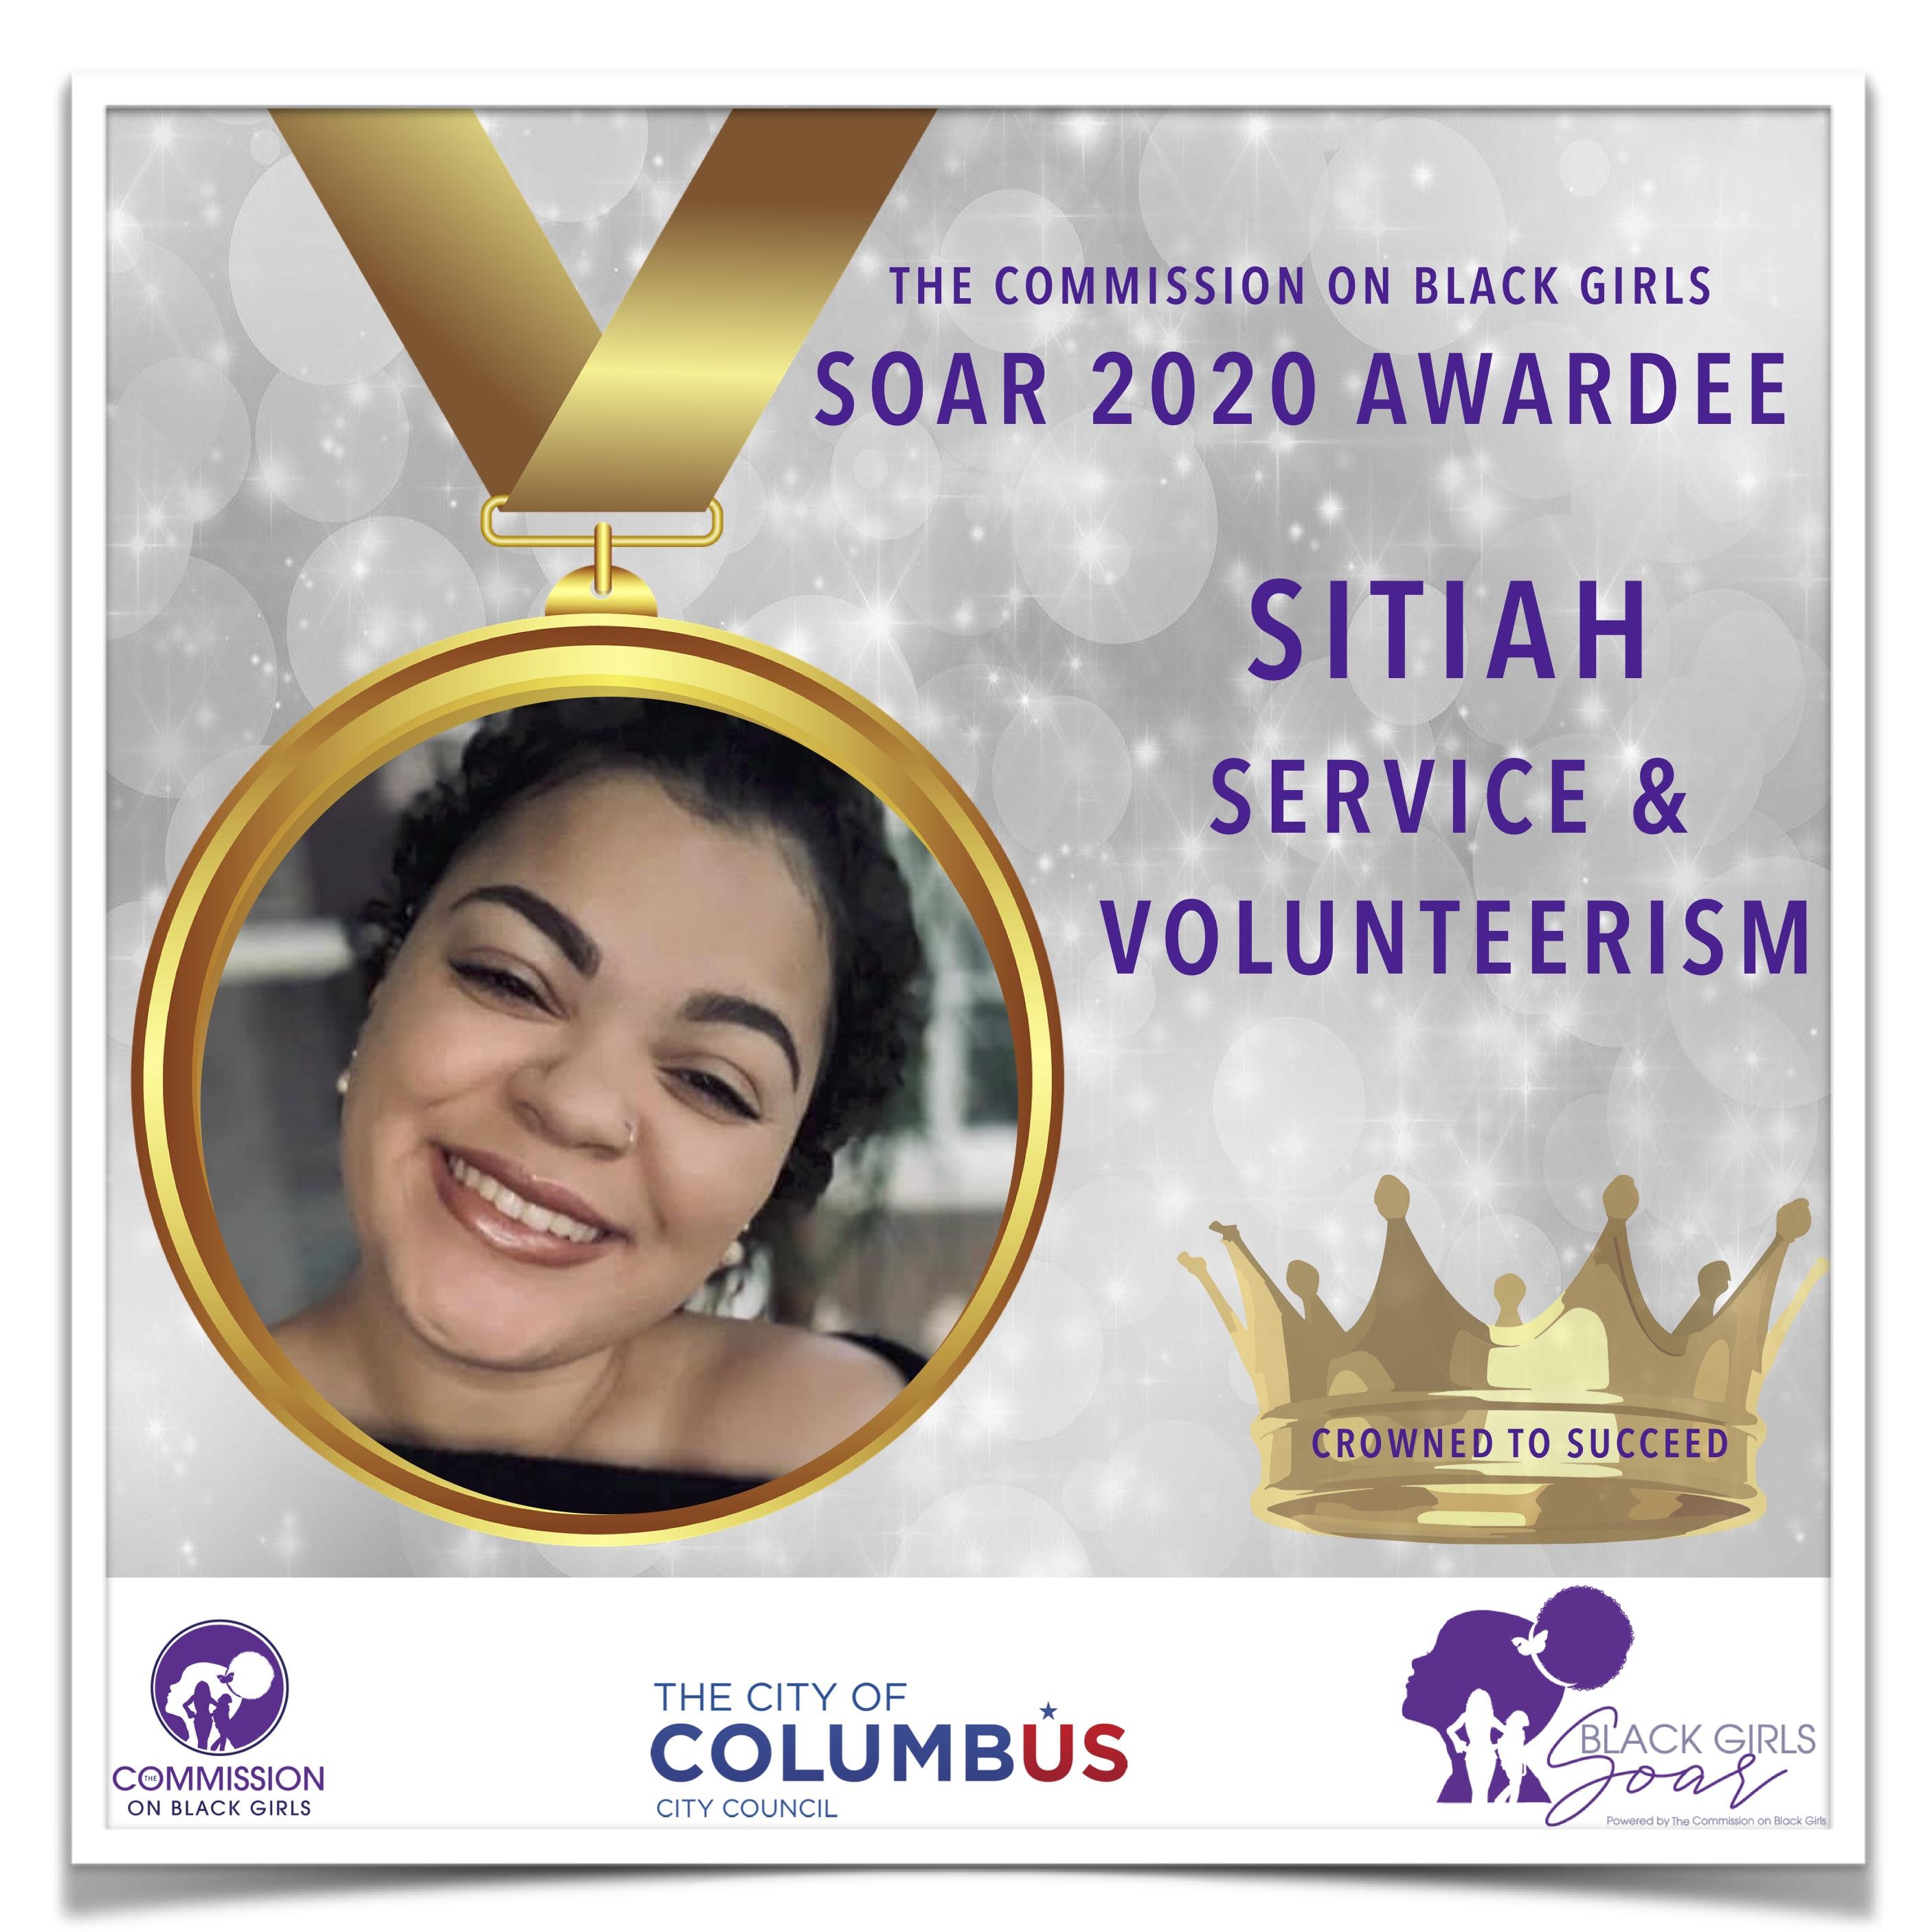 20 SOAR 2020 Sitiah Service and Voluntee